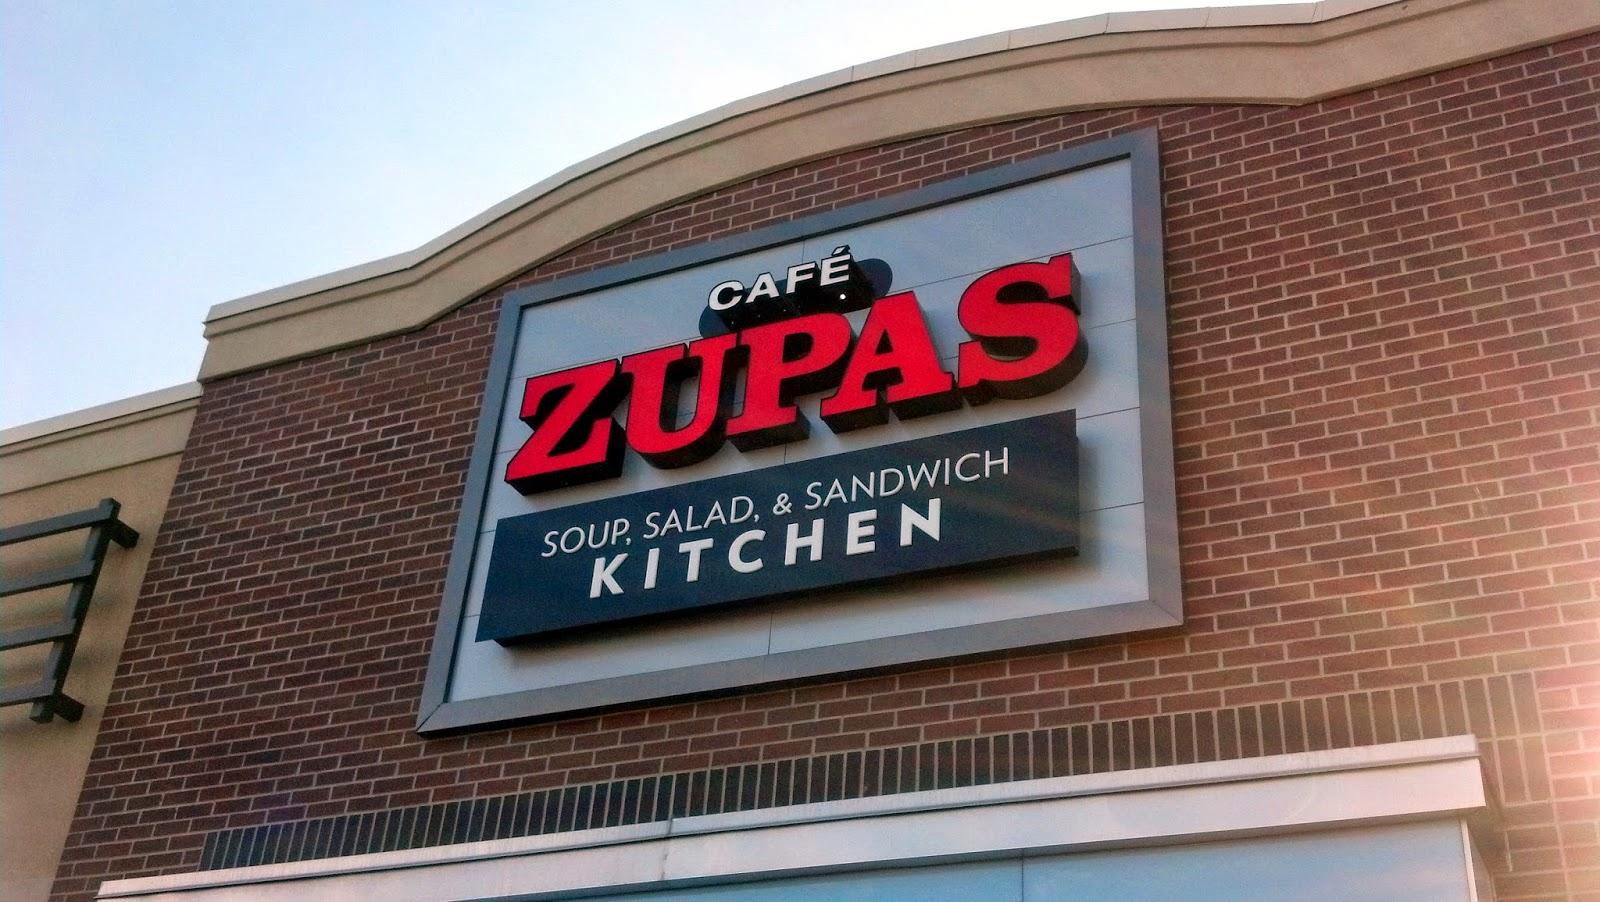 Taco Tuesday Group Reviews Cafe Zupas Soup Salad Sandwich